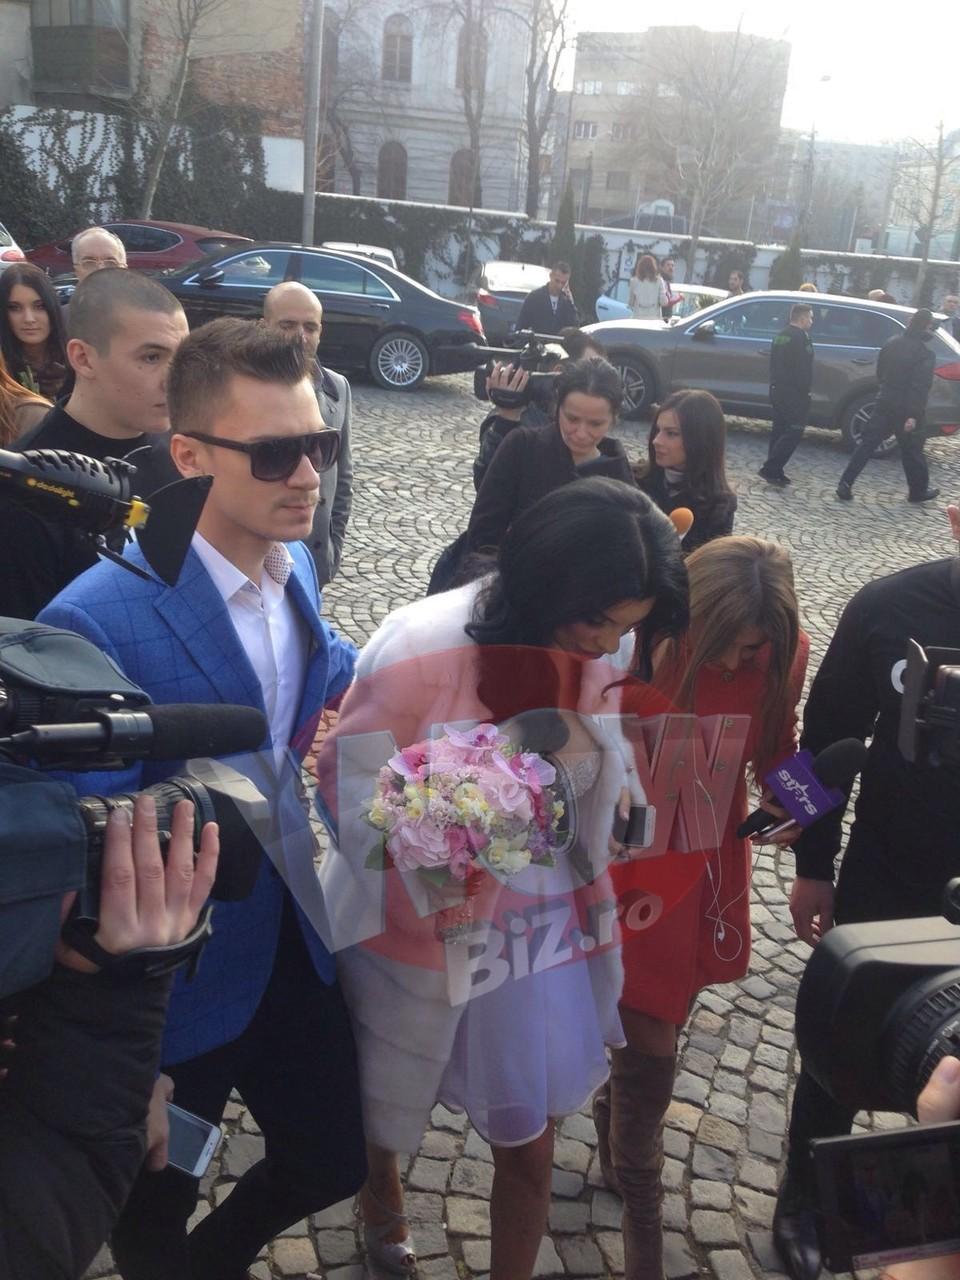 VIDEO Ziua cea mare pentru Tonciu! Andreea s-a maritat! Uite cum a aratat graviduta si ce s-a intamplat, pas cu pas, la cununia civila!